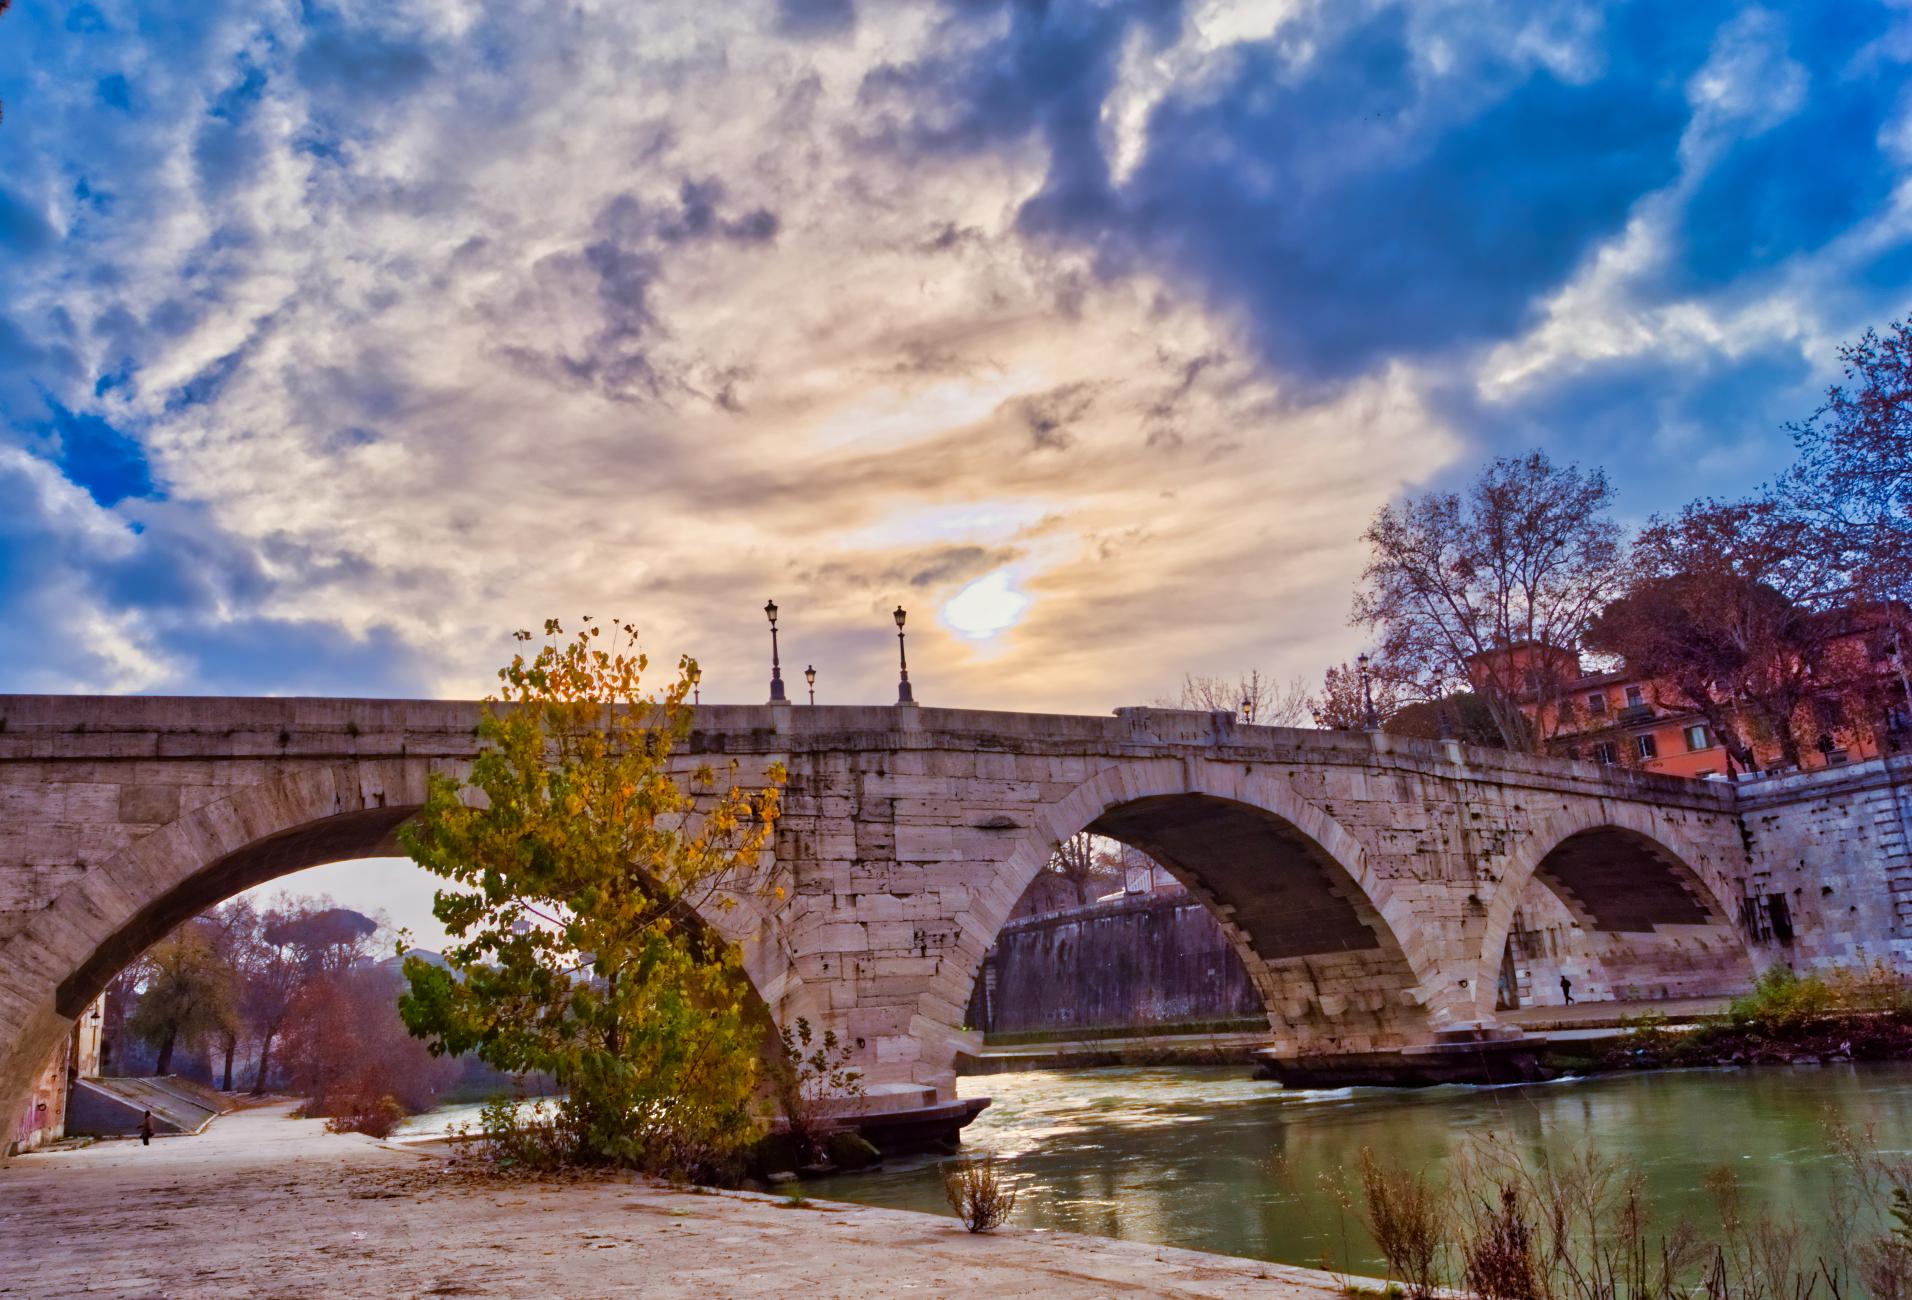 Cestio bridge